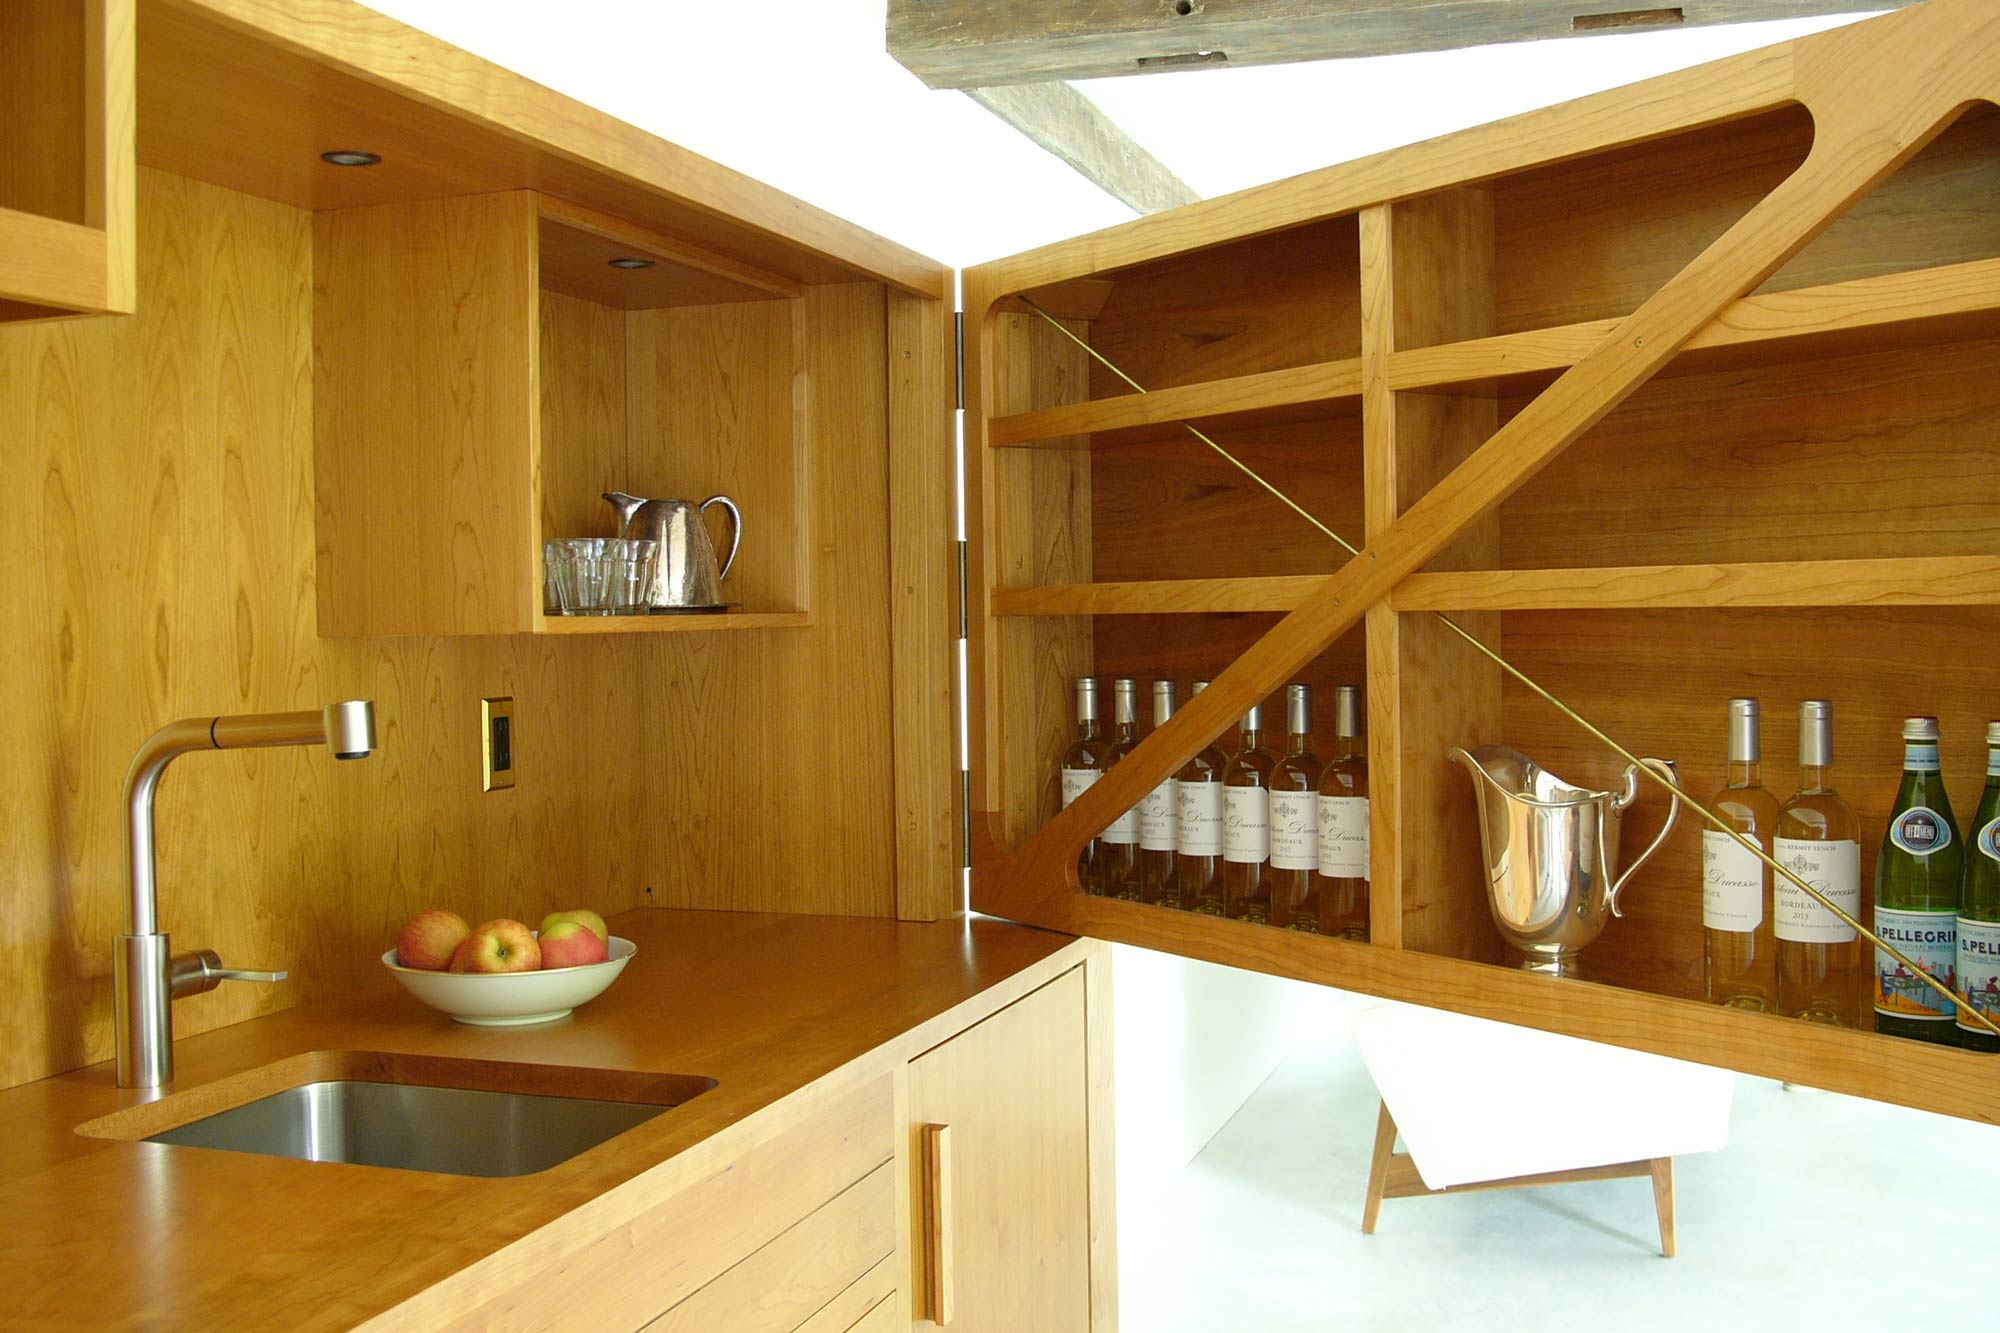 S-kitchen-open-closeup.jpg